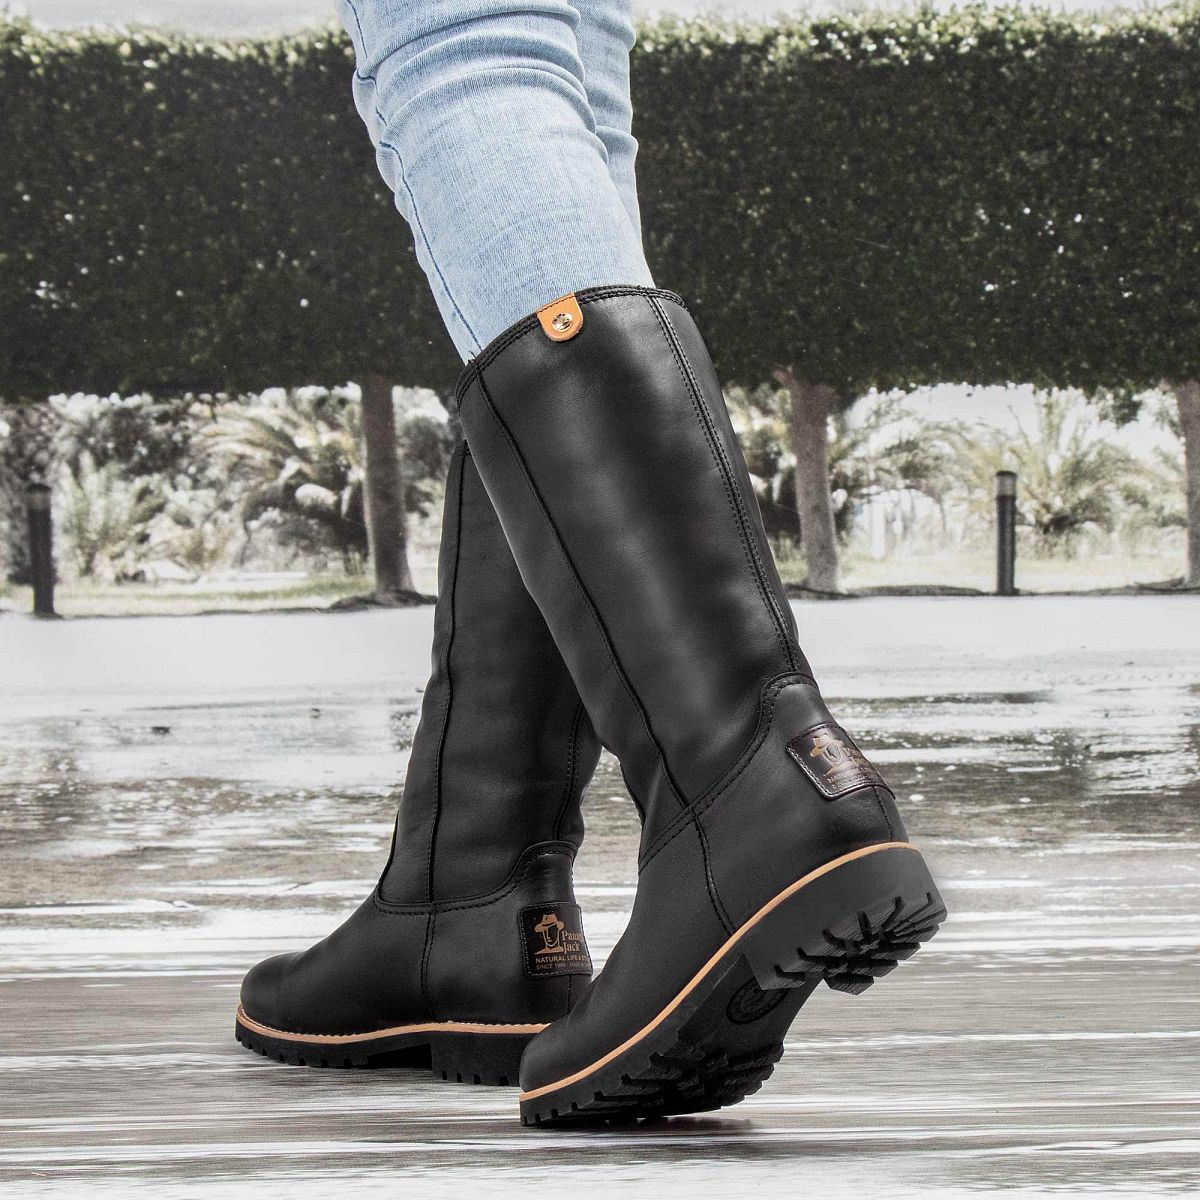 ace870c7e0ca7 Women s boot BAMBINA IGLOO TRAVELLING black